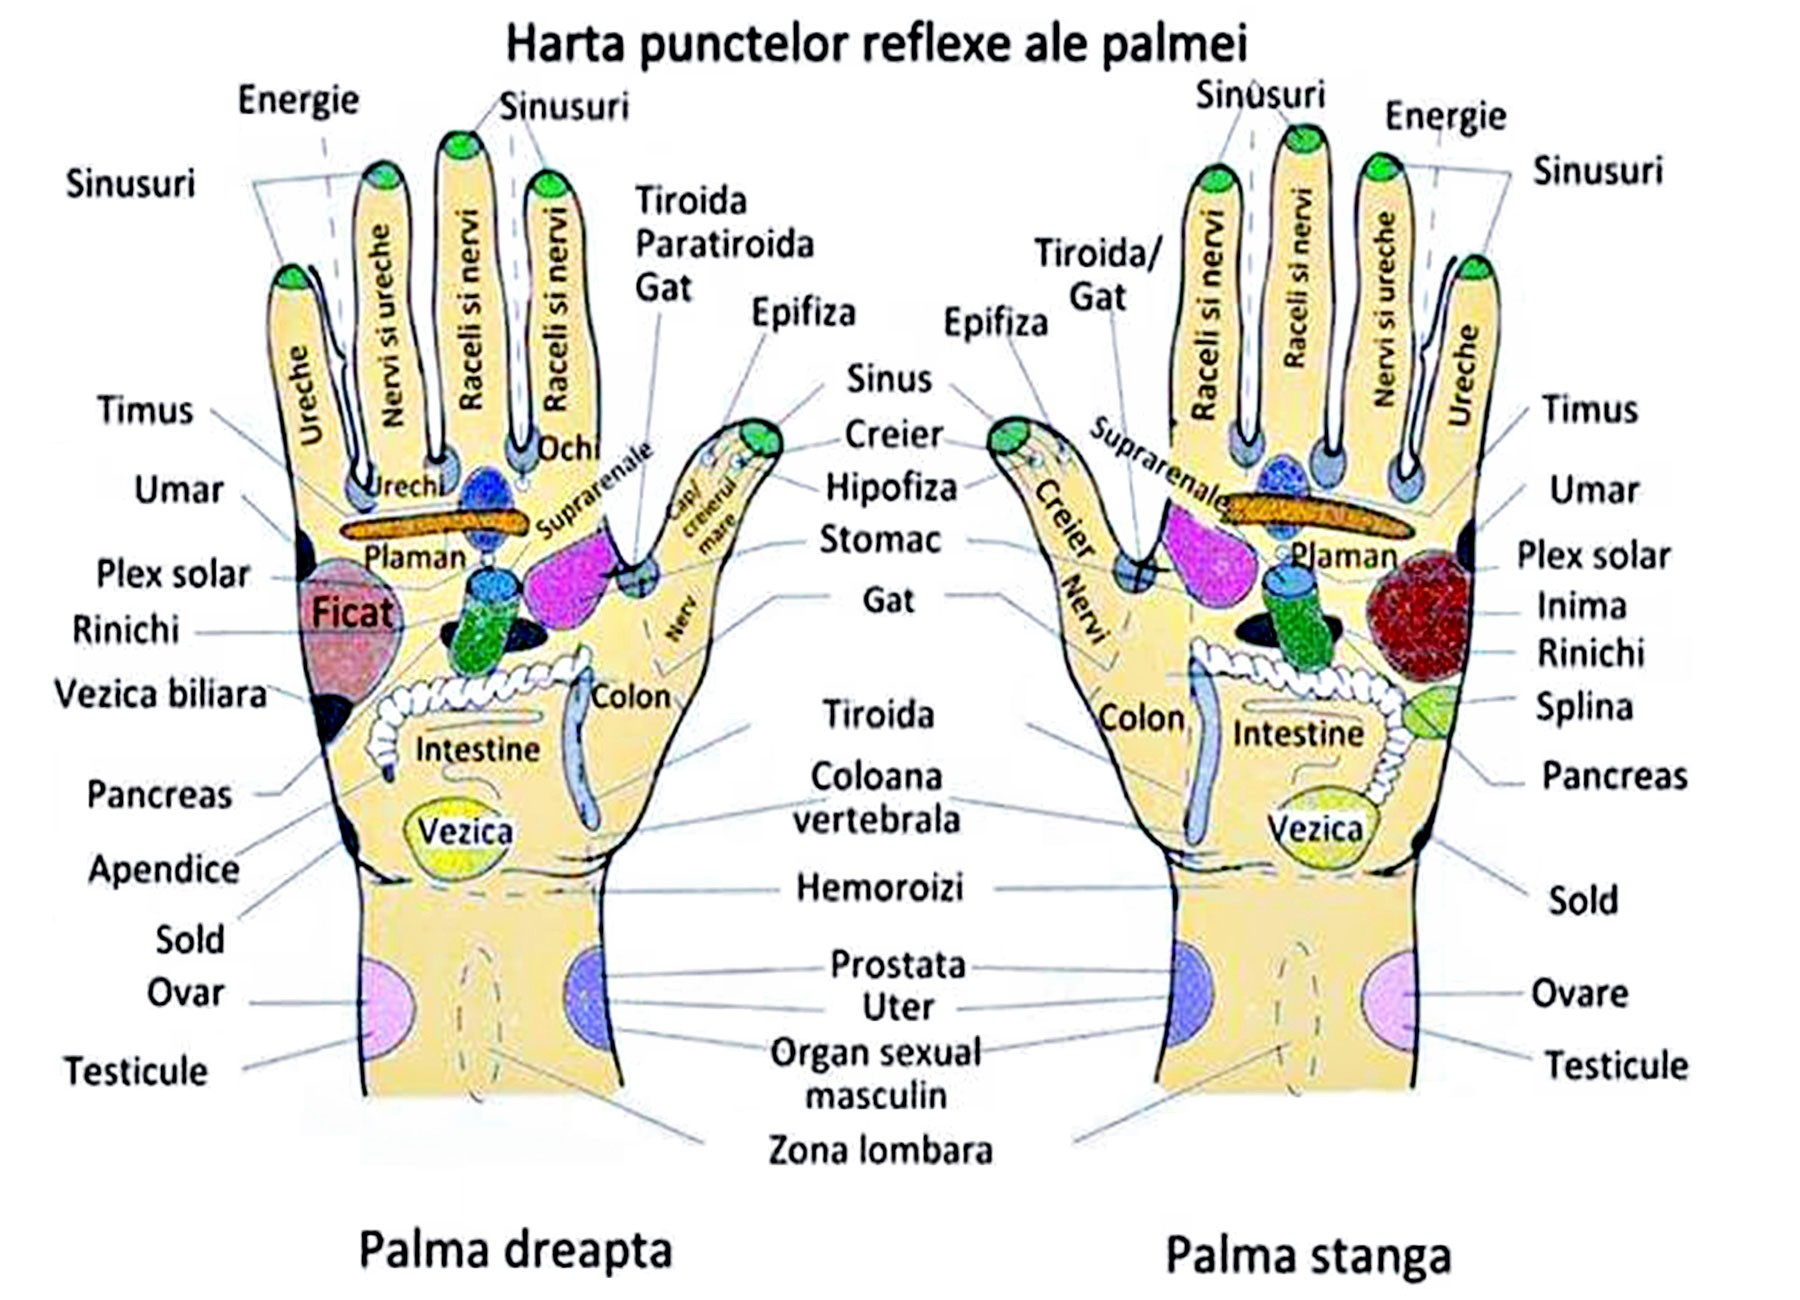 Reflexoterapie Reflexoterapia Reflexoterapiei